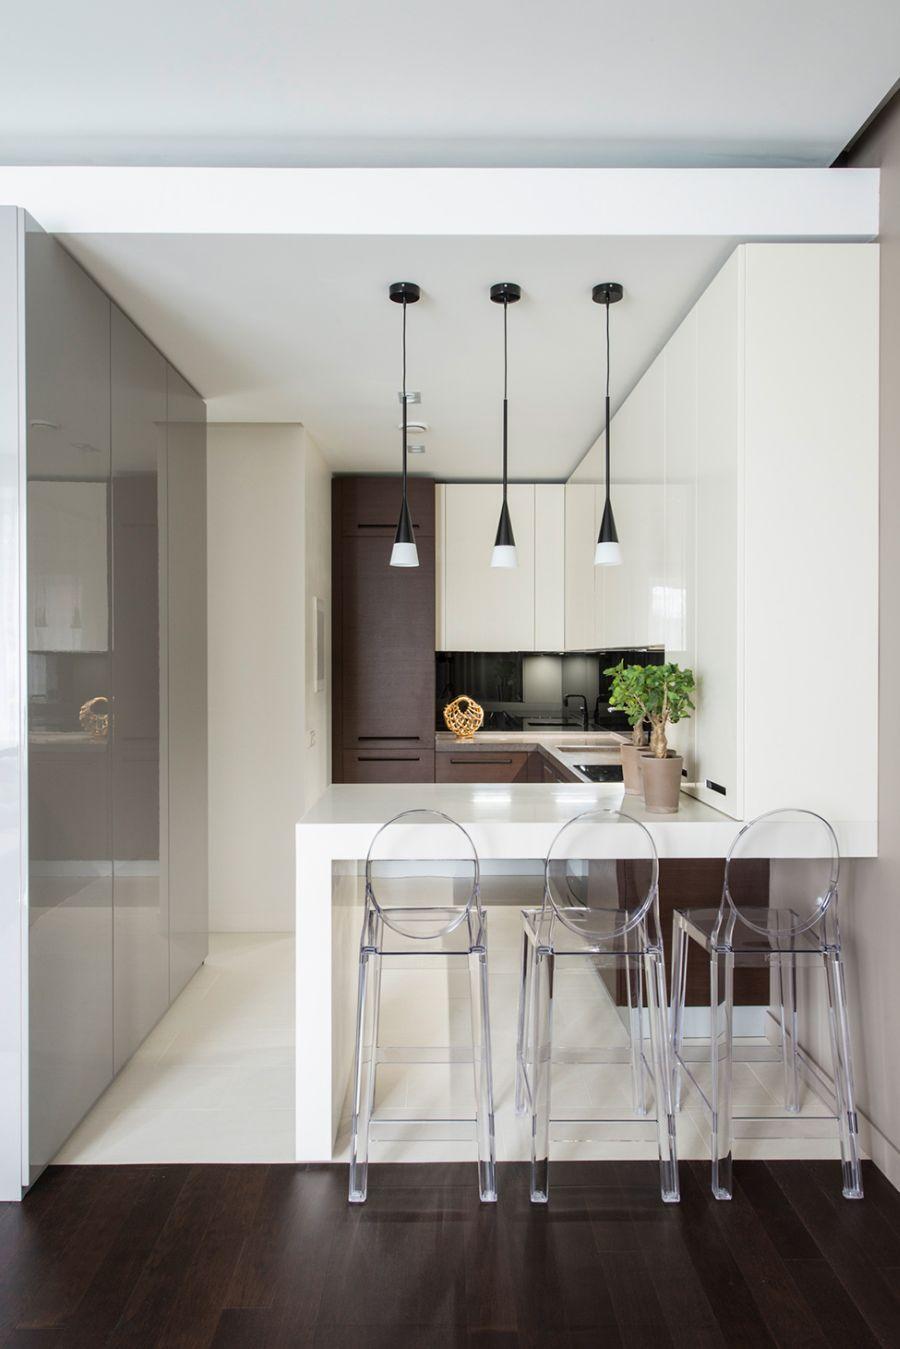 Kitchen of the minimalst home